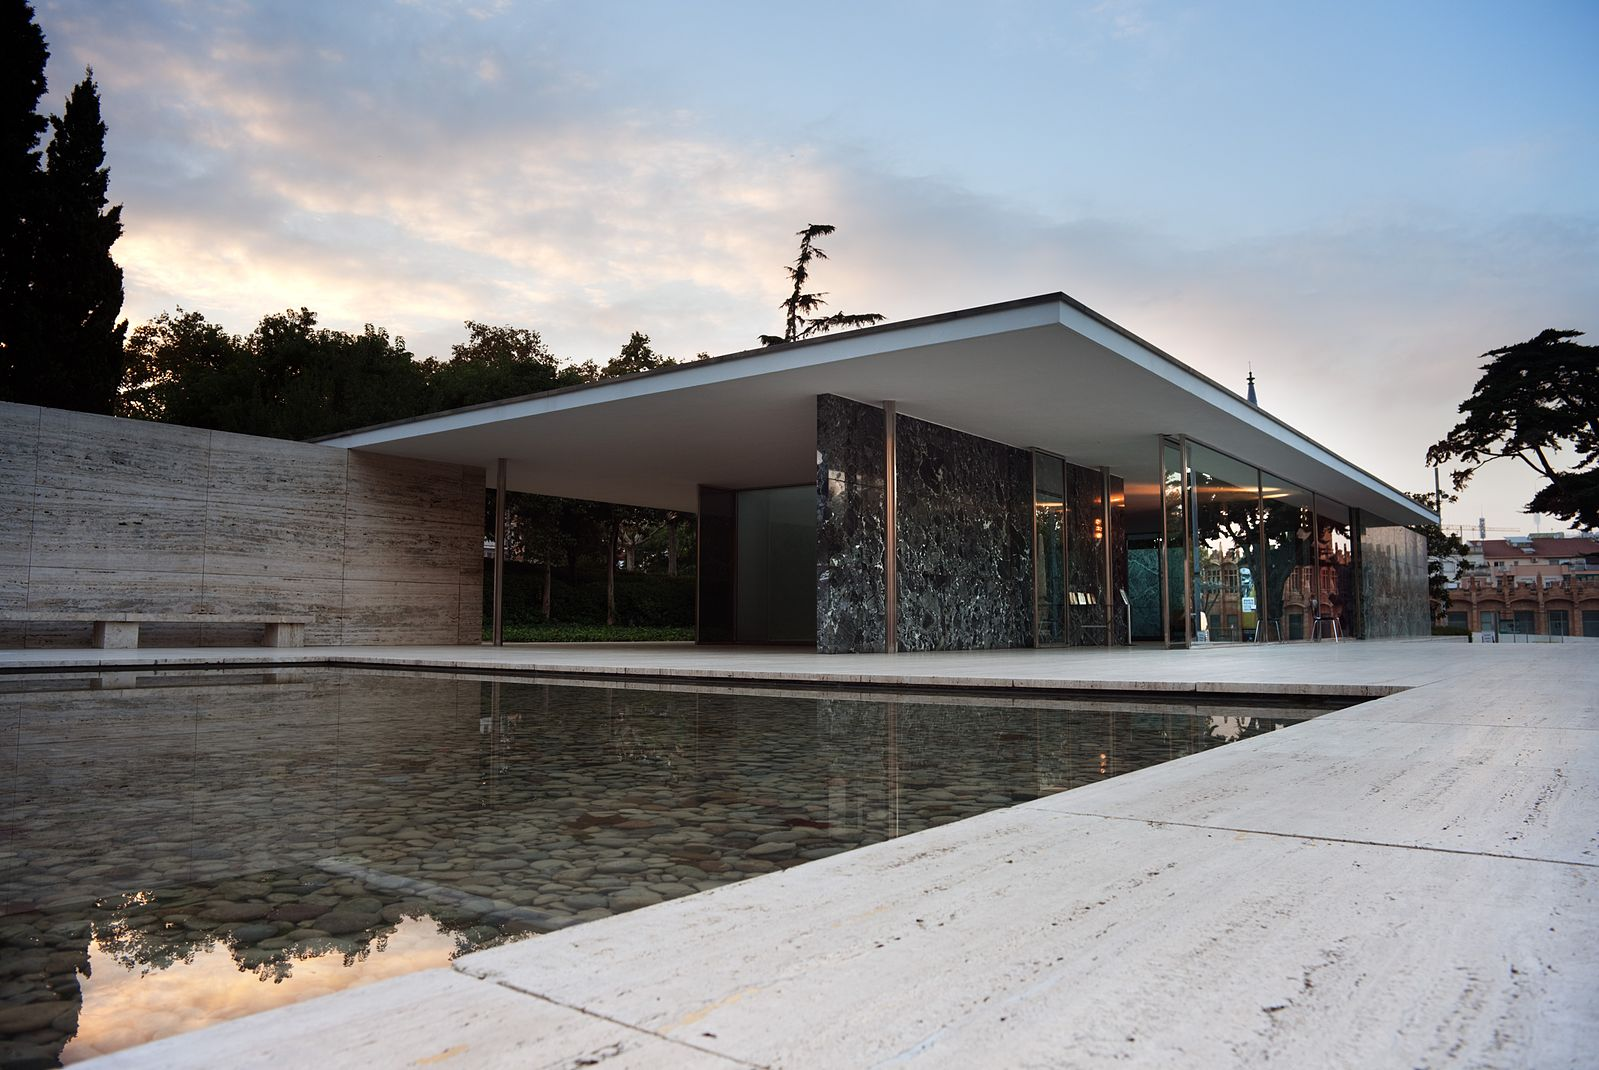 The original Barcelona Pavilion, 1928-29, by Ludwig Mies van der Rohe.